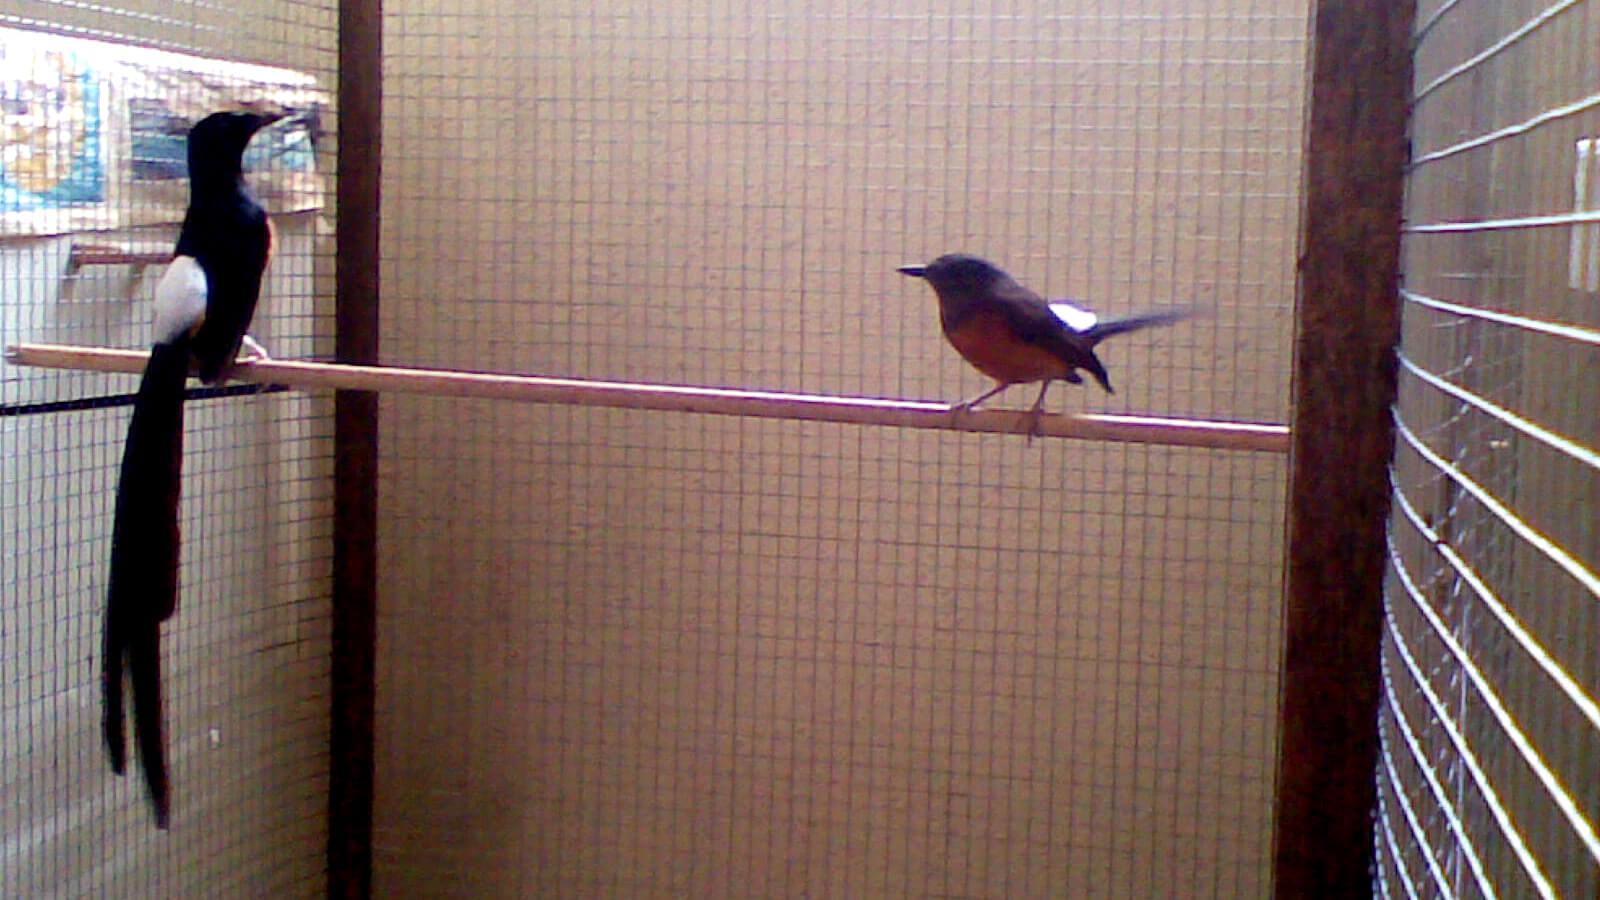 Desain Kandang Burung Murai Batu Medan Yang Kondusif Untuk Berkembang Biak